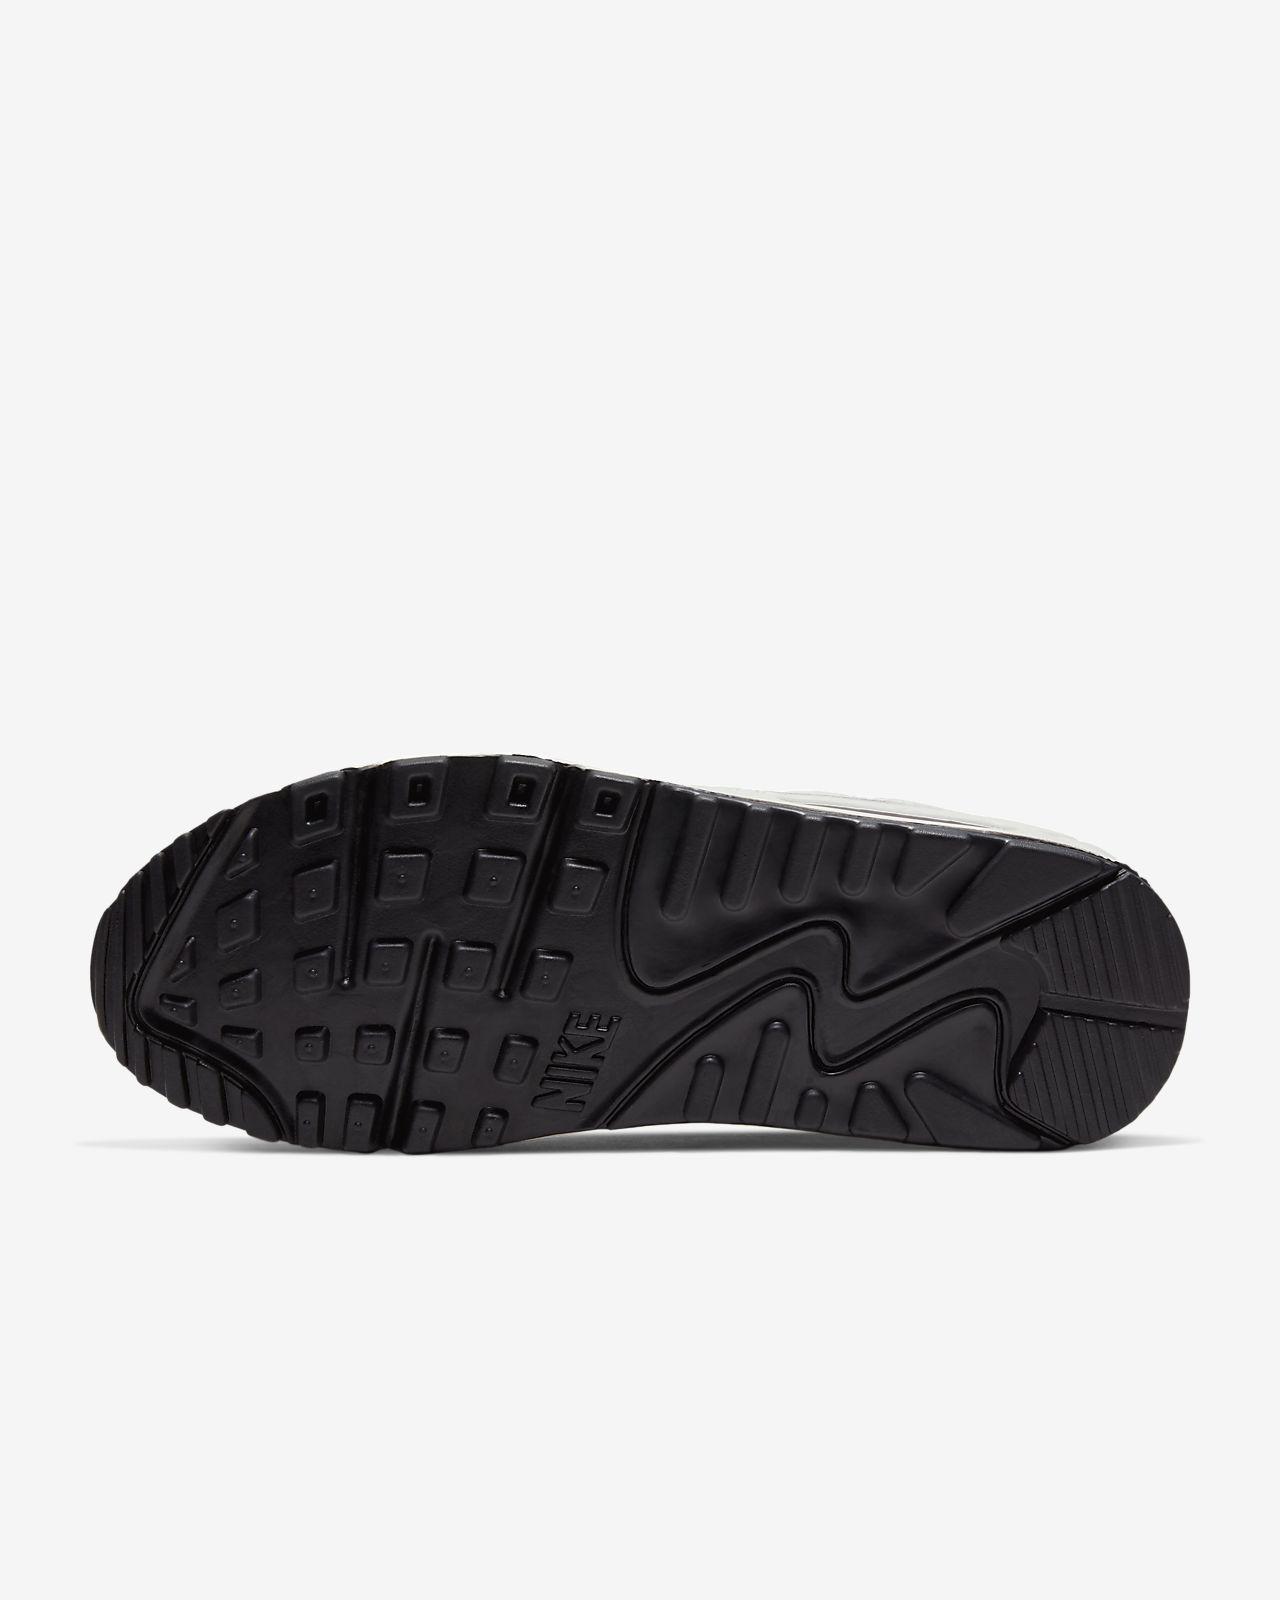 Nike Air Max 90 Valentine's Day Women's Shoe